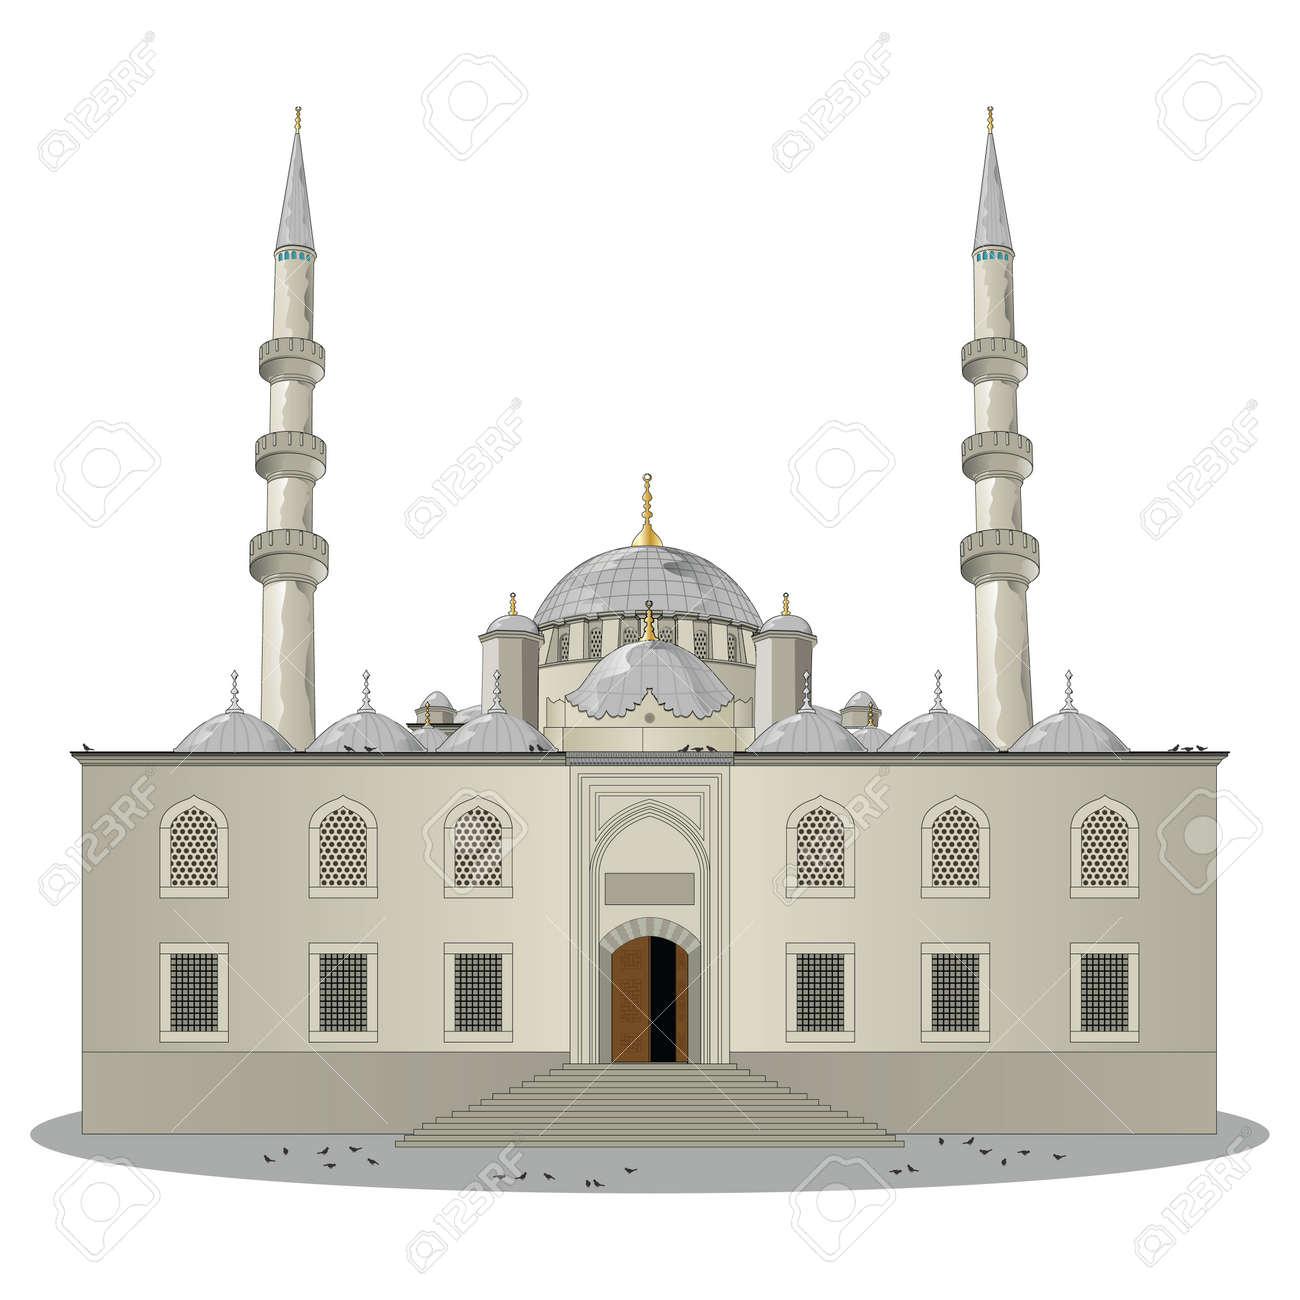 The New Mosque pronounced Yeni jami main entrance view in Eminonu, Istanbul, Turkey. Vector, illustration. Stock Vector - 45222045